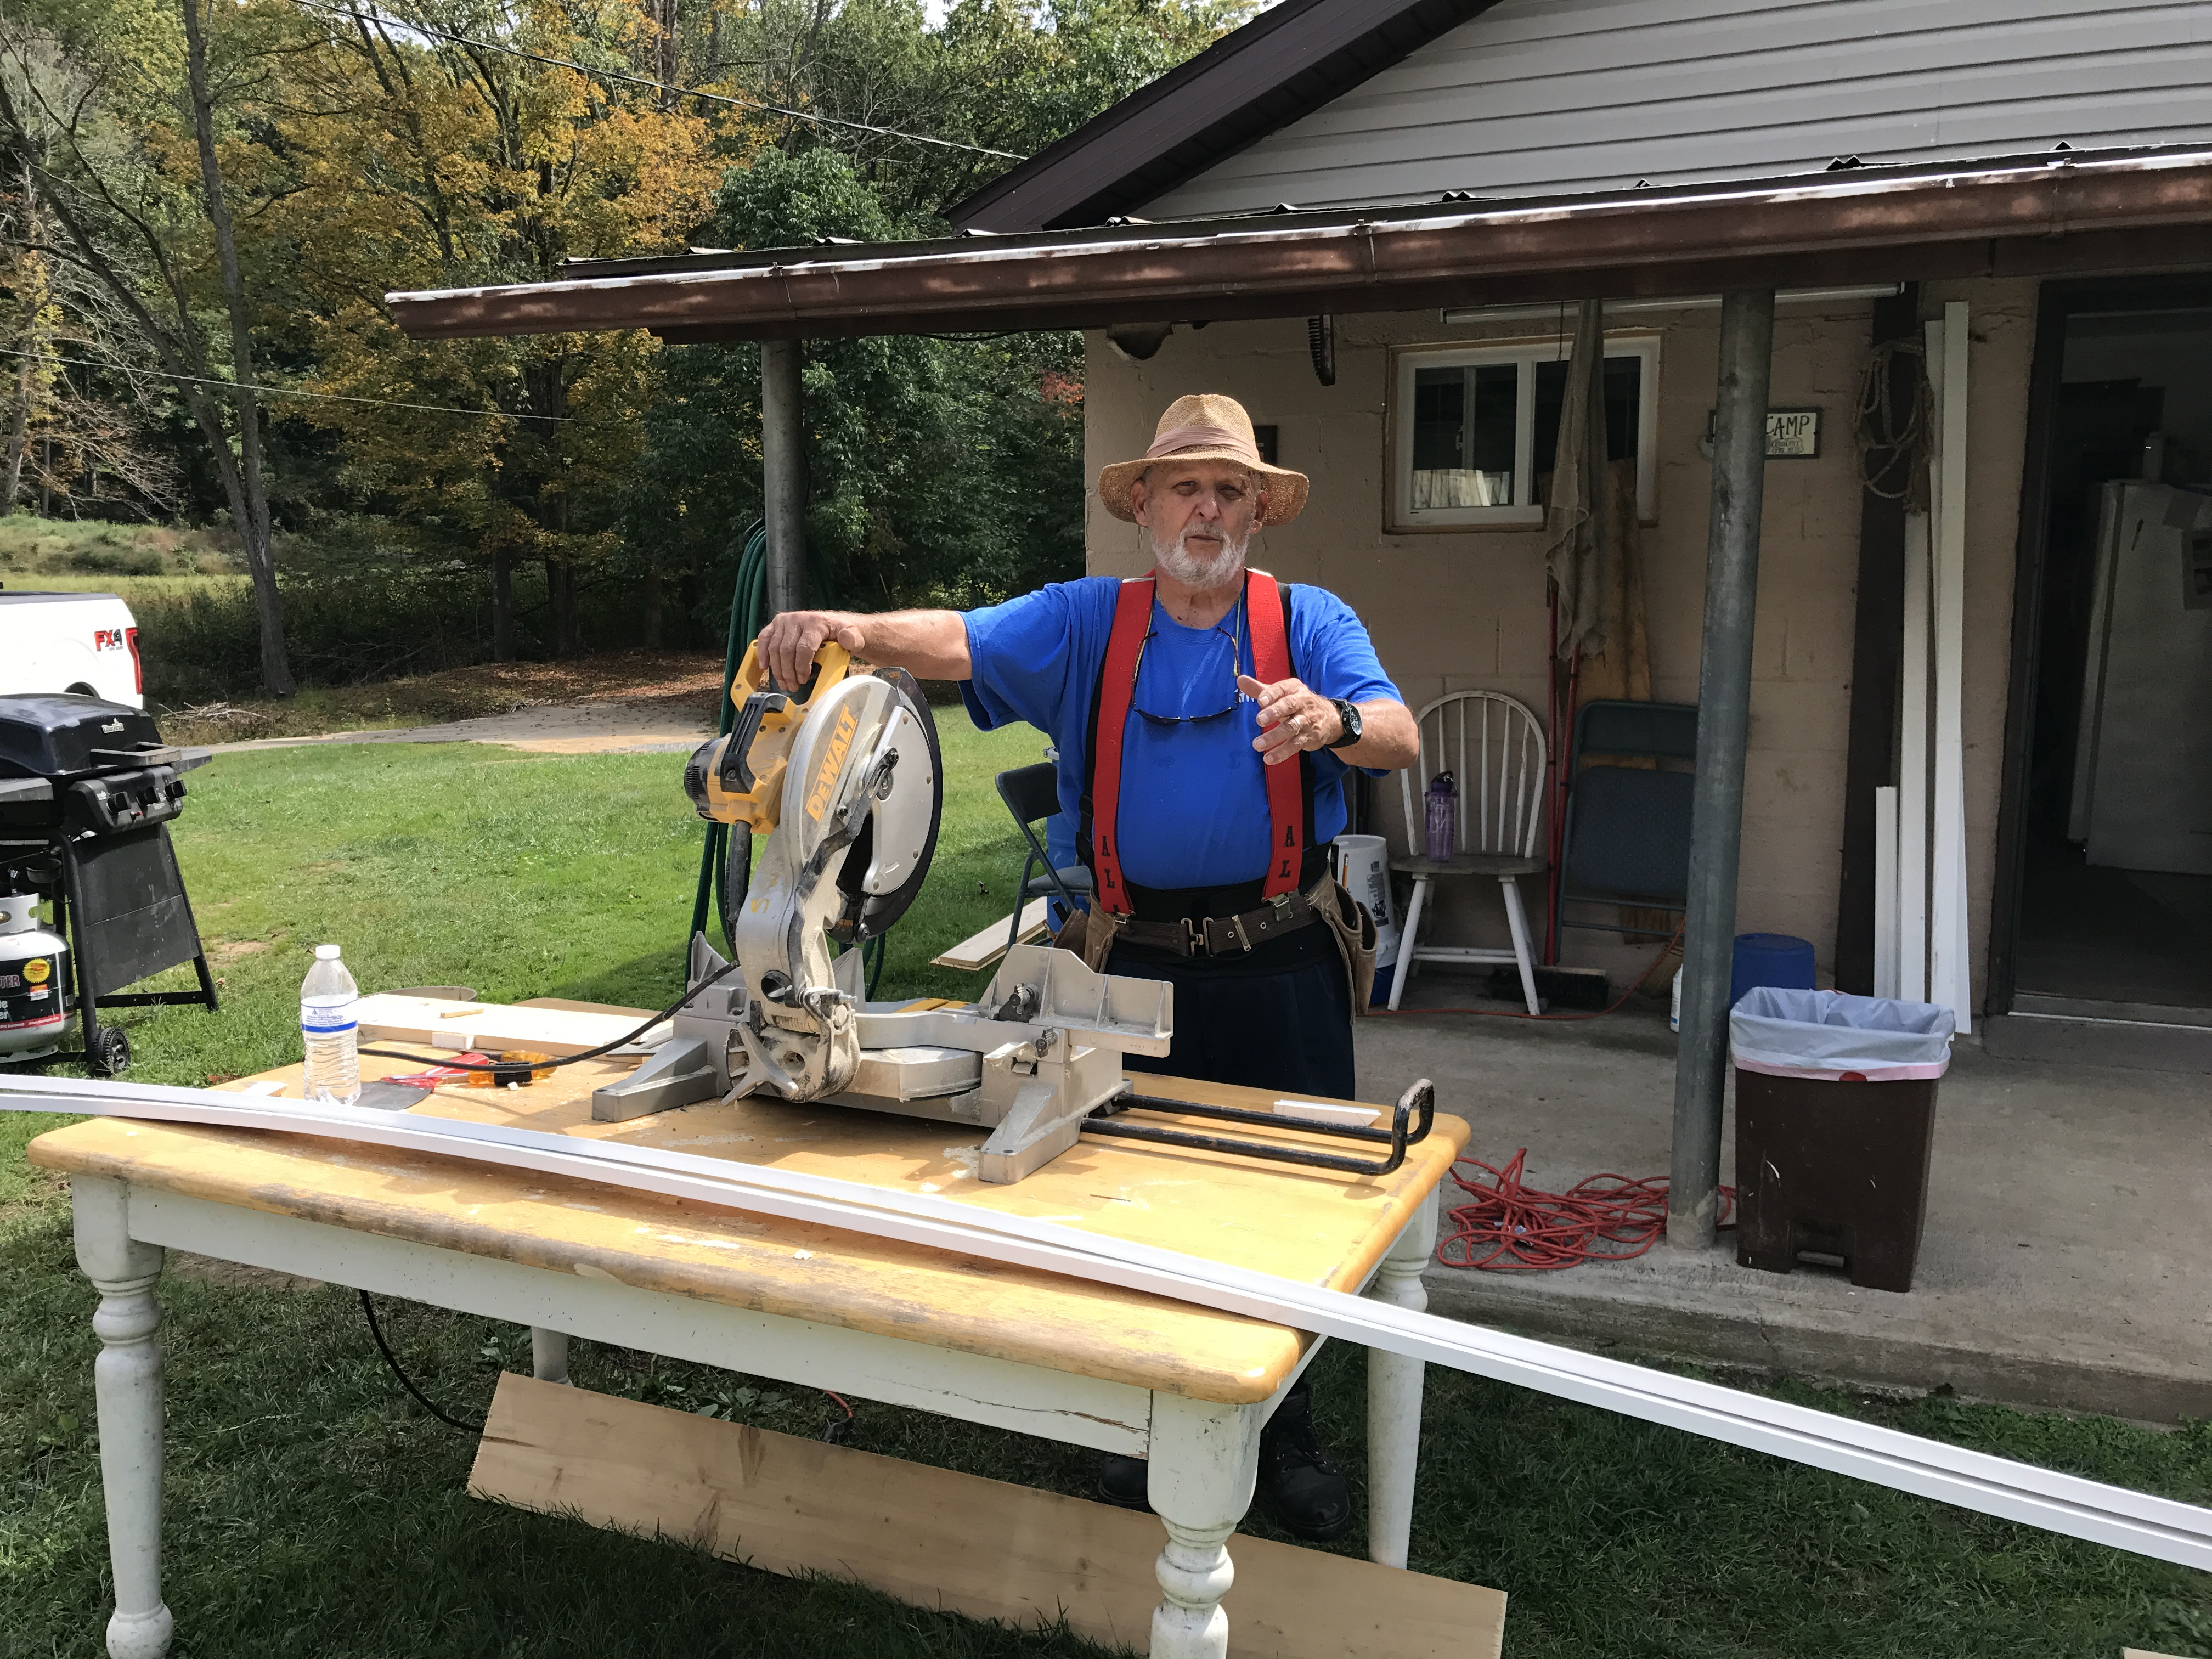 Grant working the circular saw